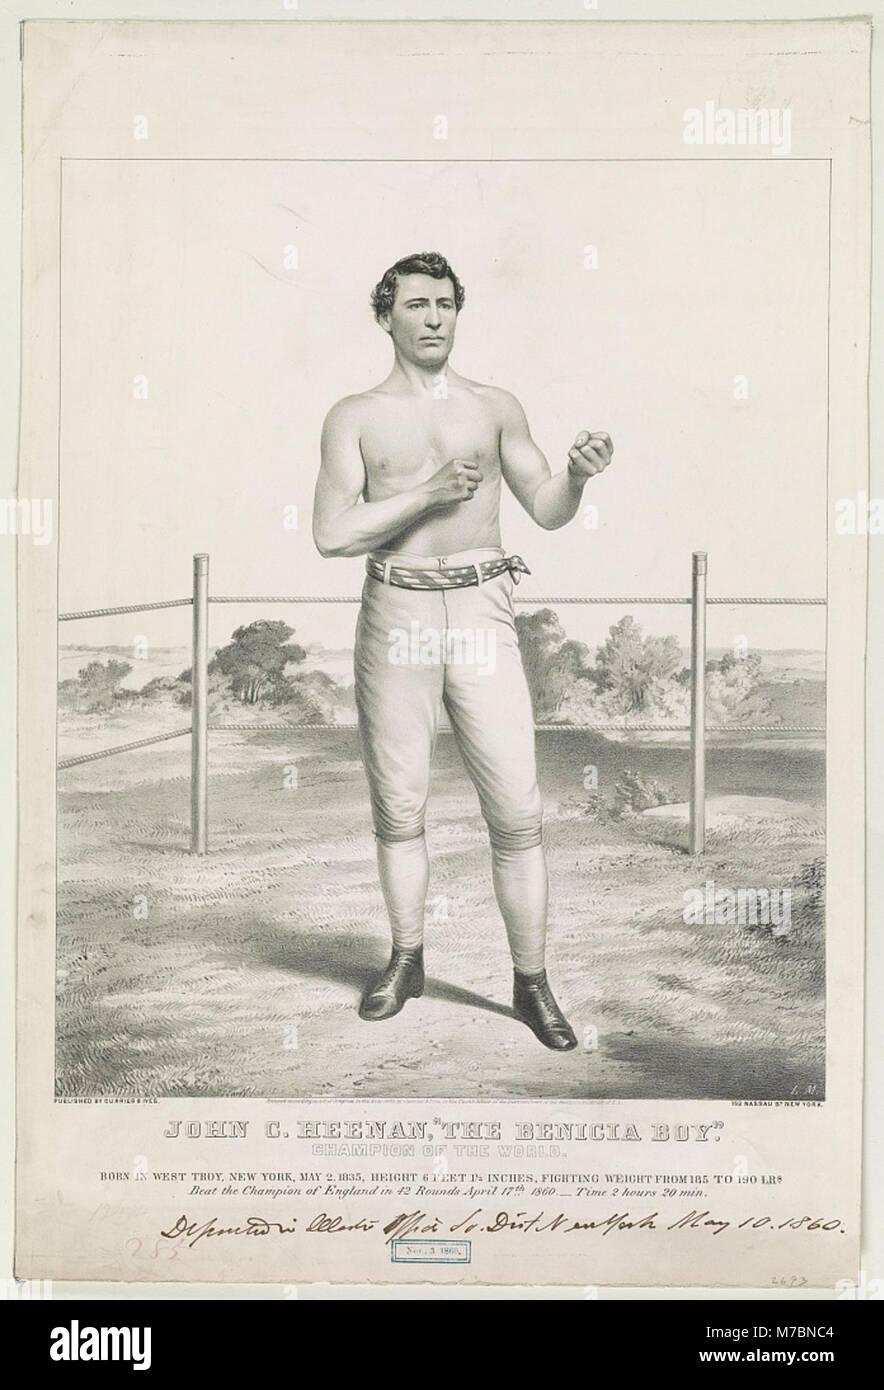 John C. Heenan, 'The Benicia Boy' - champion of the world - L.M. LCCN90710655 - Stock Image